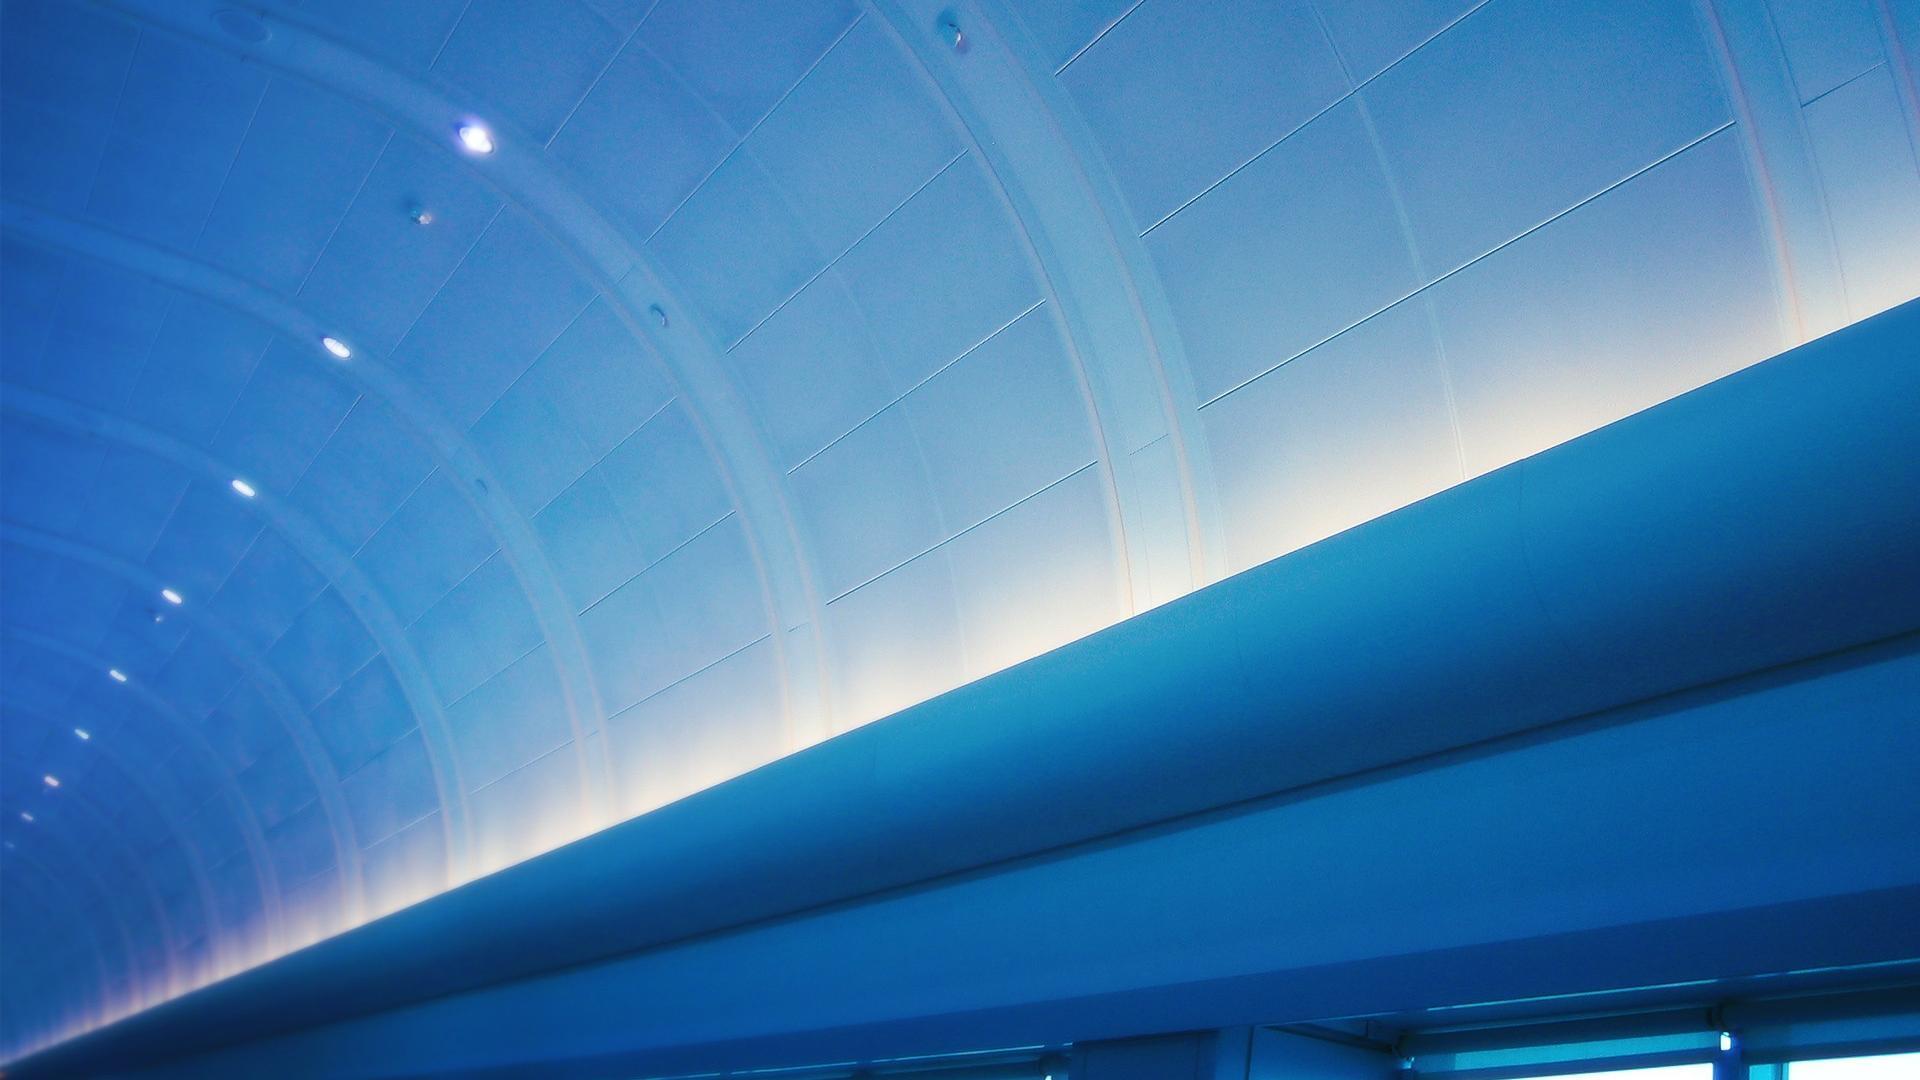 Architecture blue modern wallpaper 68352 1920x1080